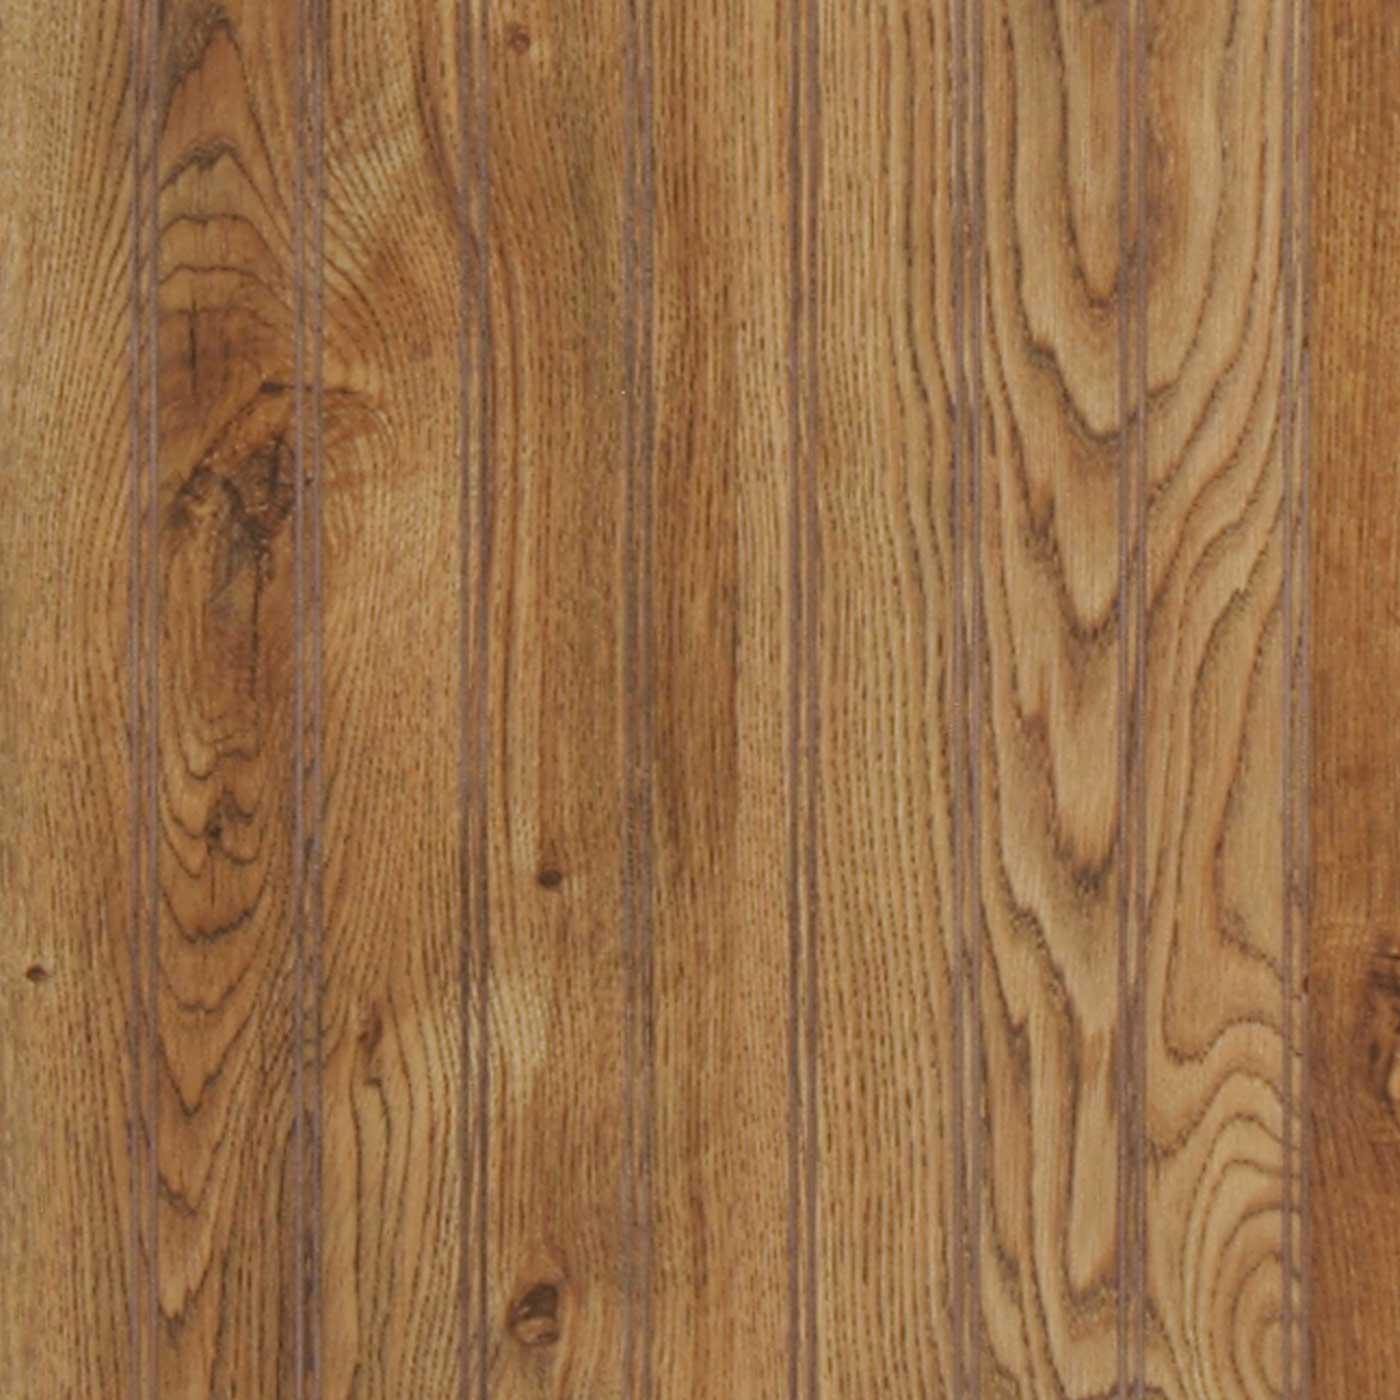 3 4 4x8 Oak Plywood C3 G1s 18mm